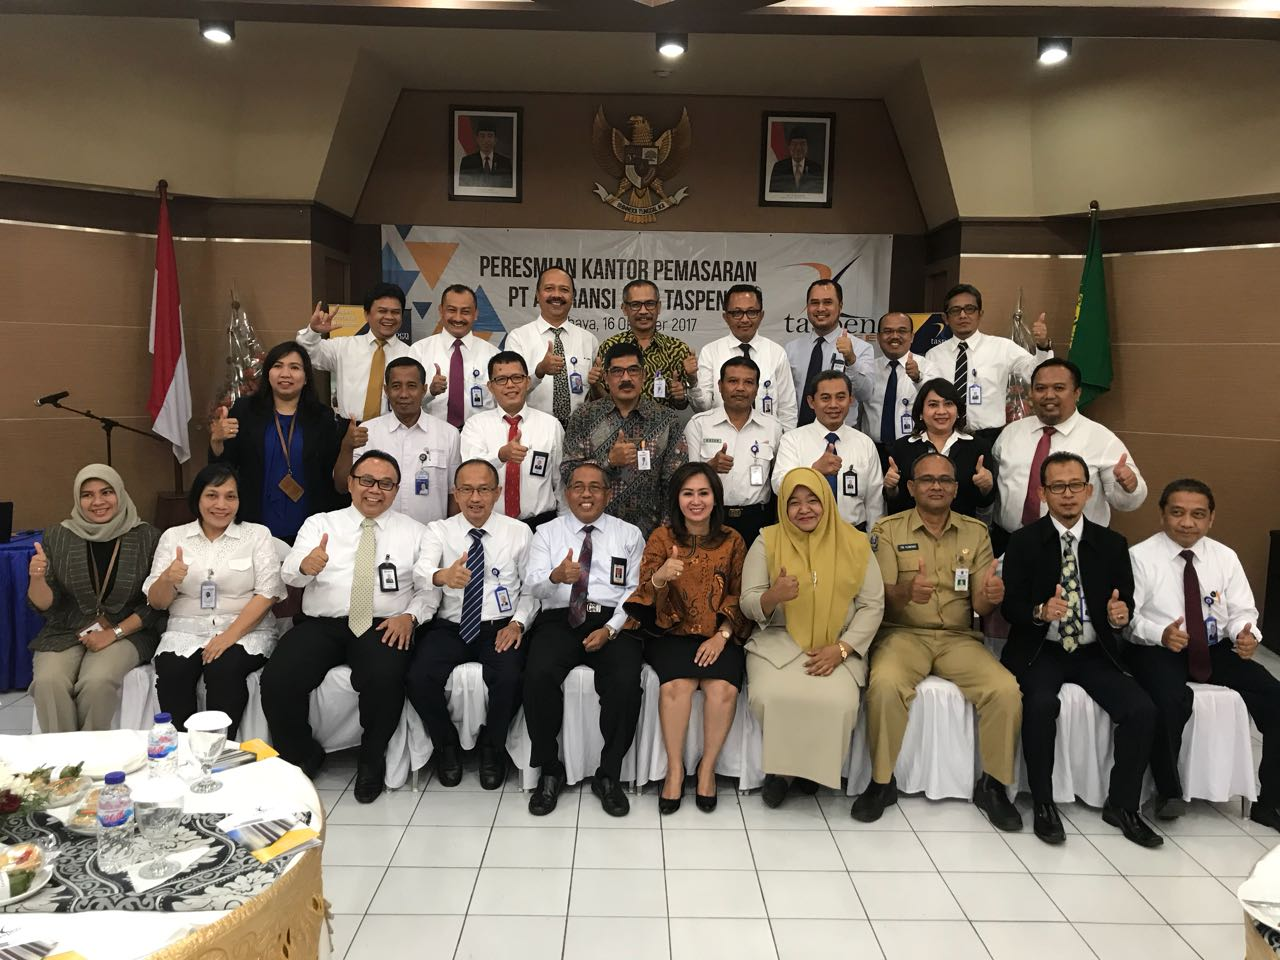 Perluas Pangsa Pasar, Taspen Life Buka Kantor Pemasaran di Surabaya